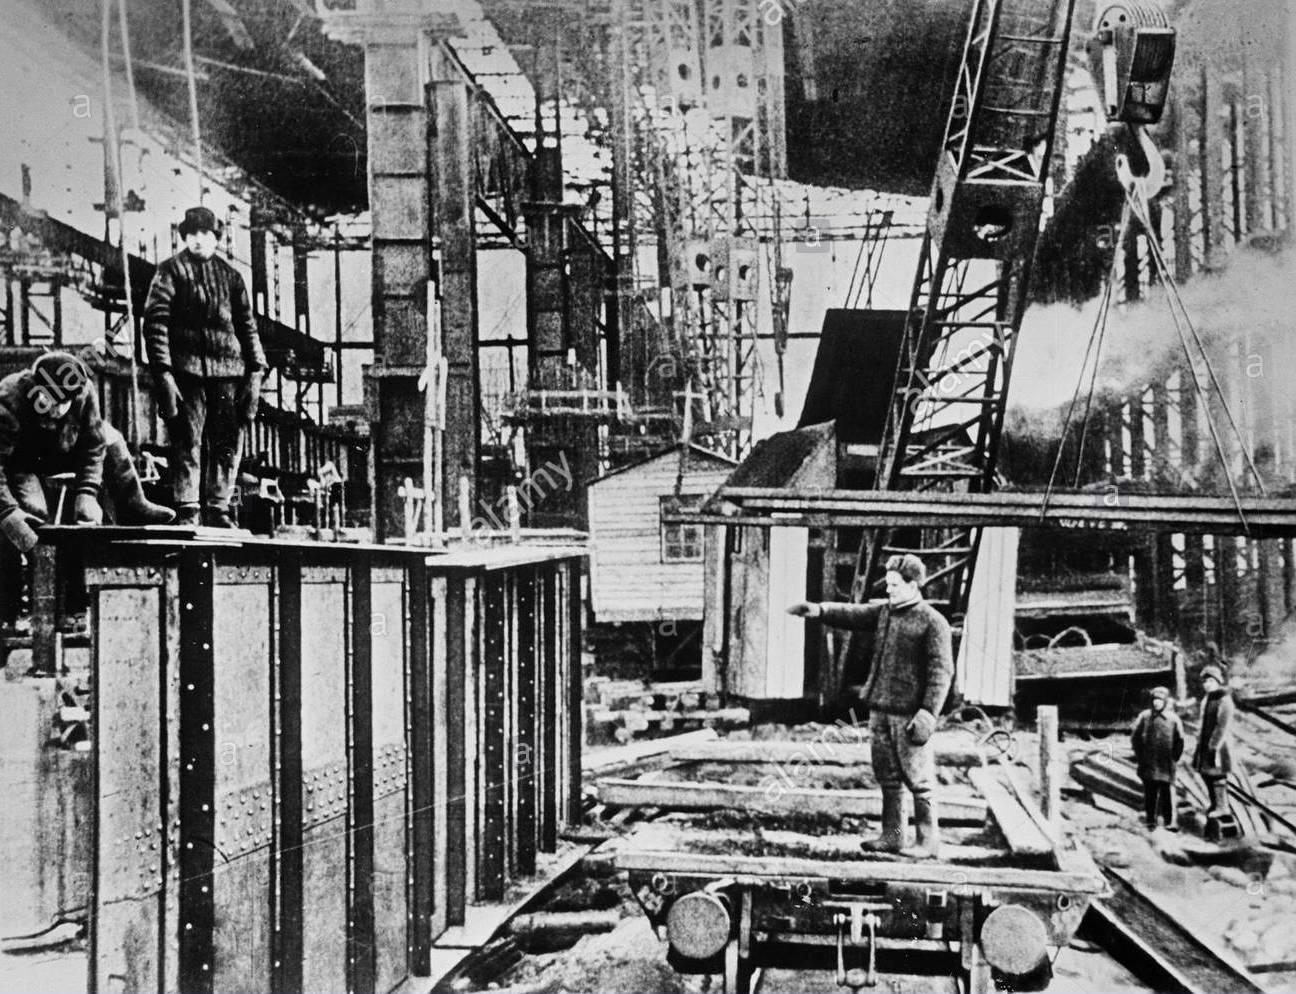 construction-of-a-new-open-hearth-plant-in-ural-EK3C3W.jpg